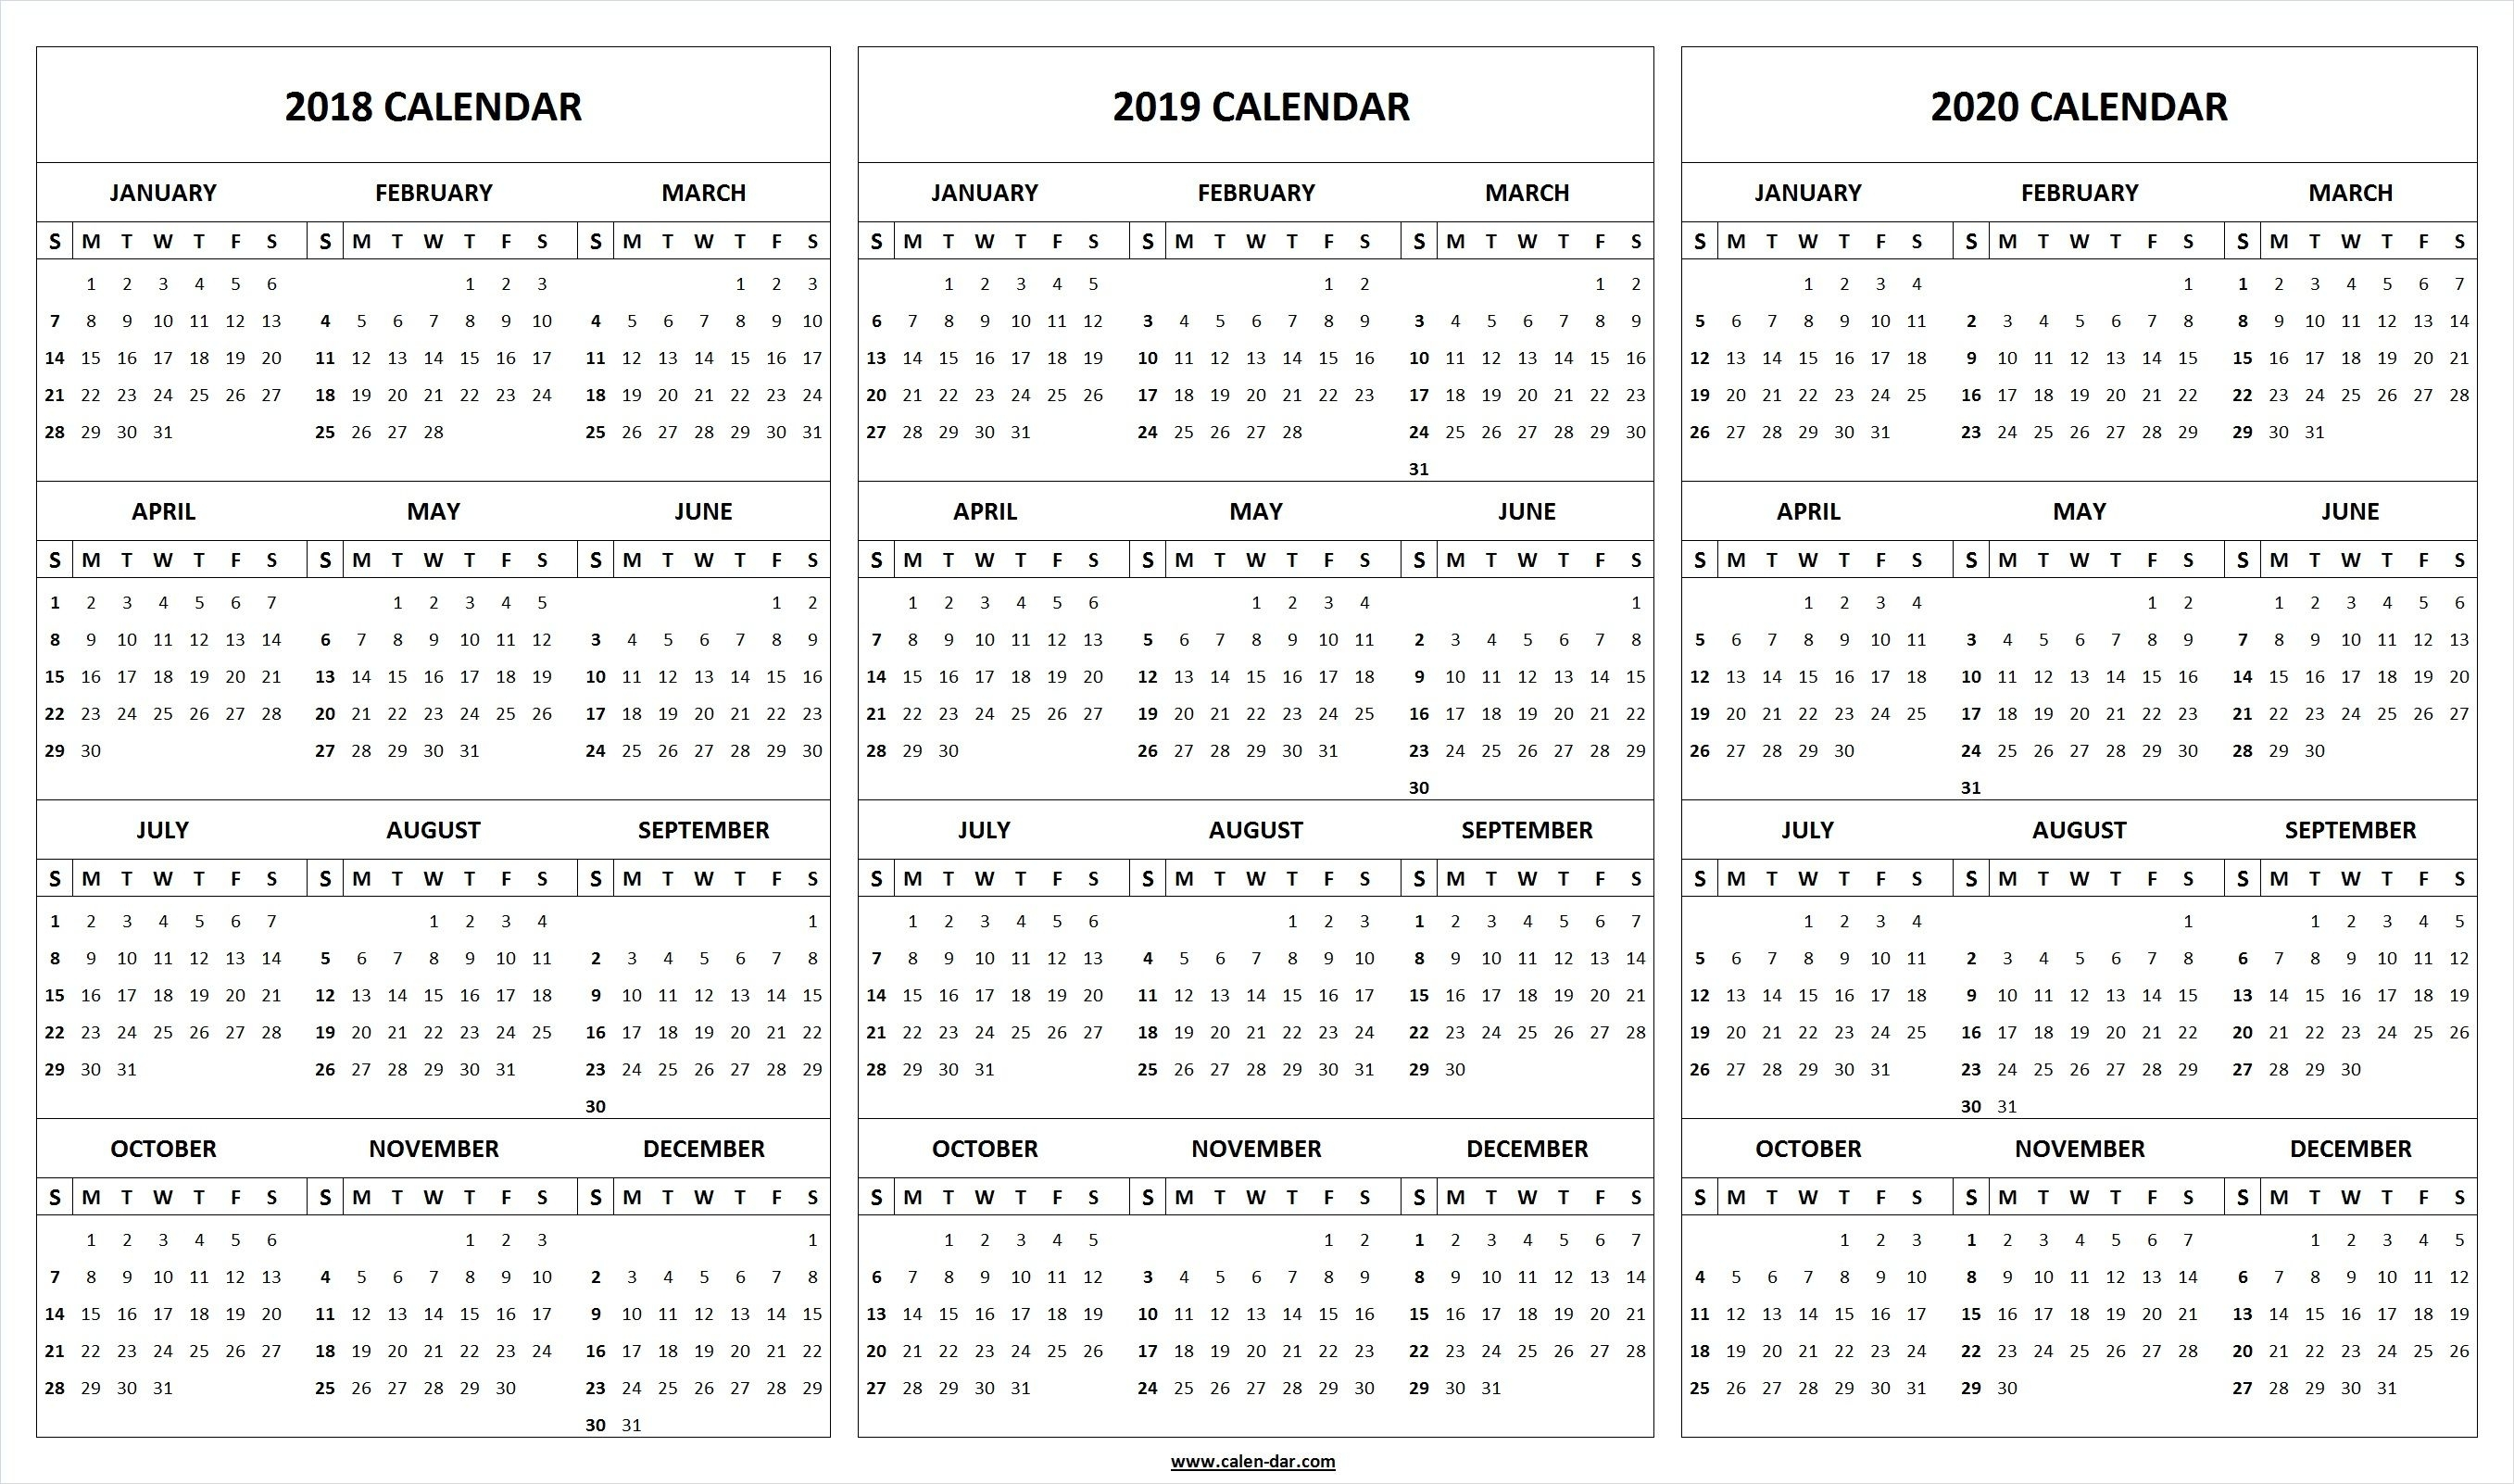 Print Blank 2018 2019 2020 Calendar Template | Organize! | Printable with Calendar At A Glance 2019-2020 Printable